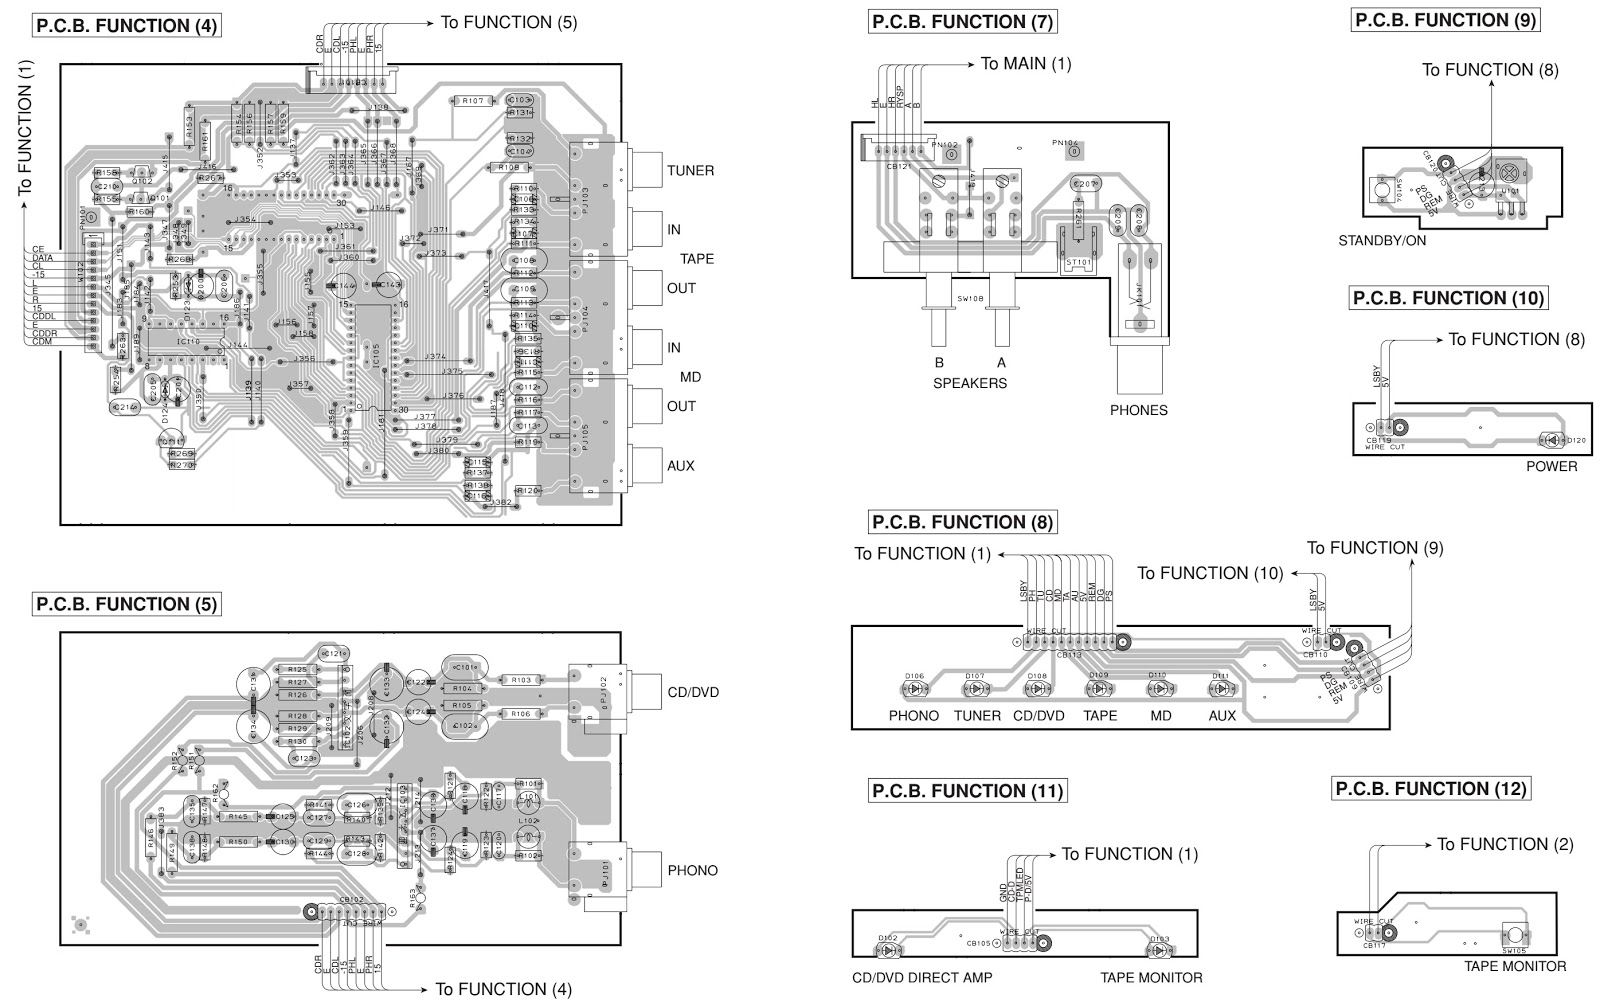 medium resolution of yamaha ax396 stereo amplifier circuit diagram yamaha guitar amp schematics yamaha yfz450 service manual